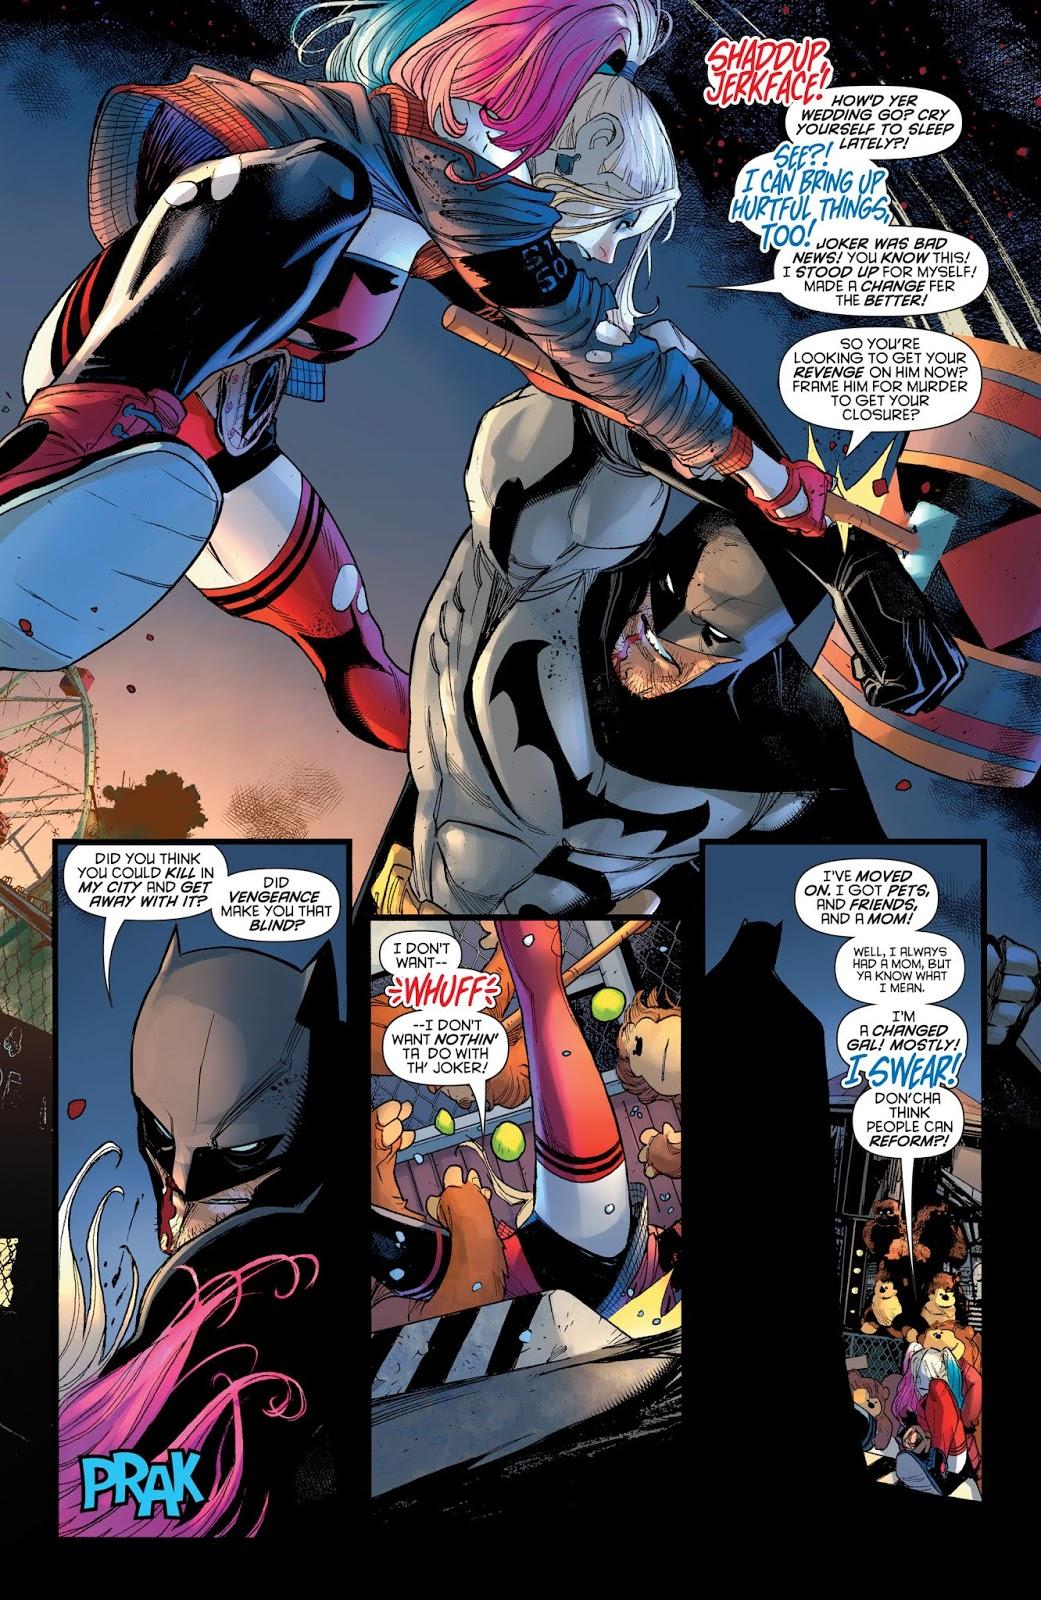 Batman VS Harley Quinn (Harley Quinn Vol 3 #57)